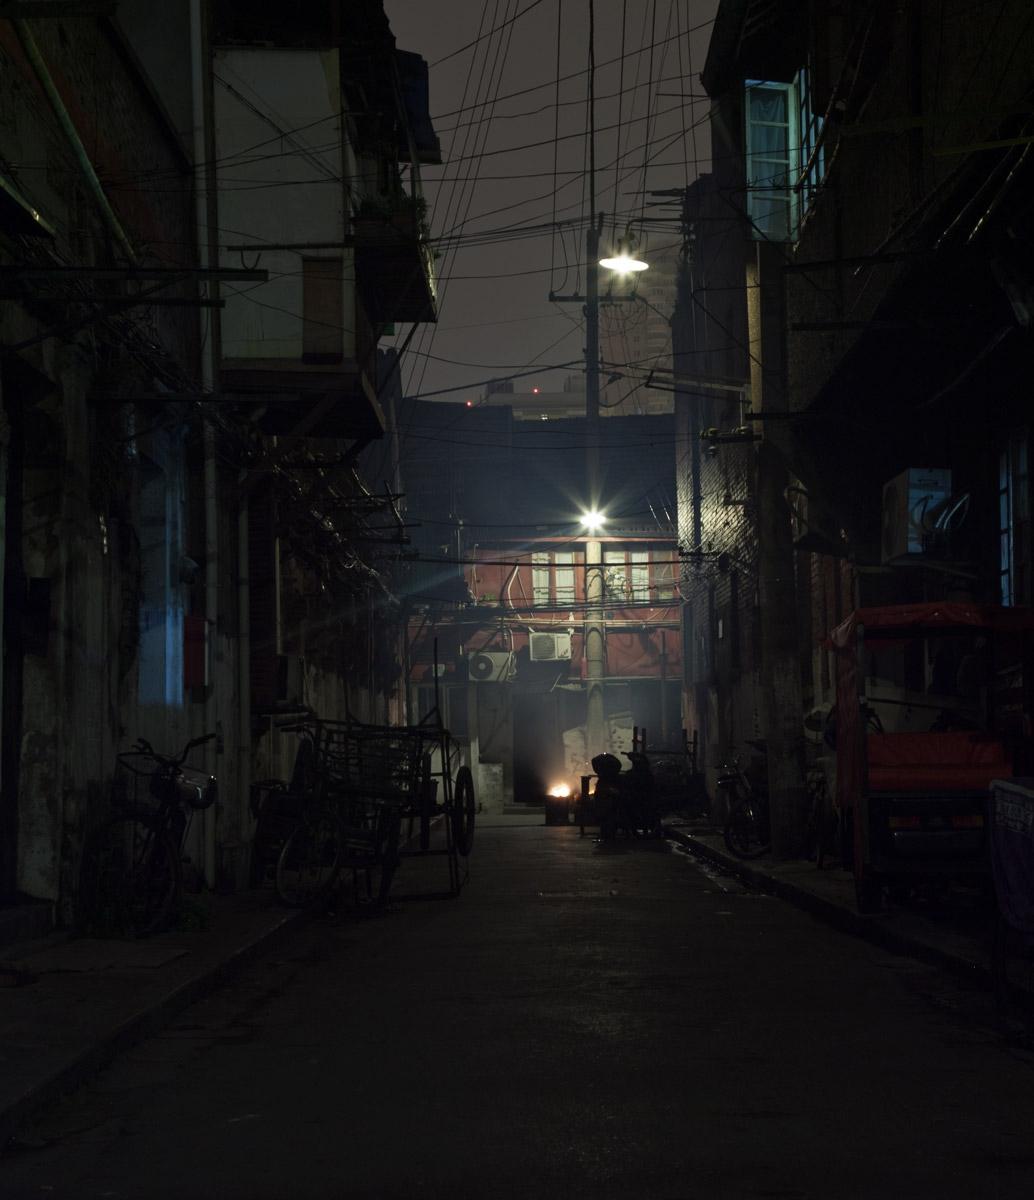 nightphotography, longexposure - cluster4000   ello